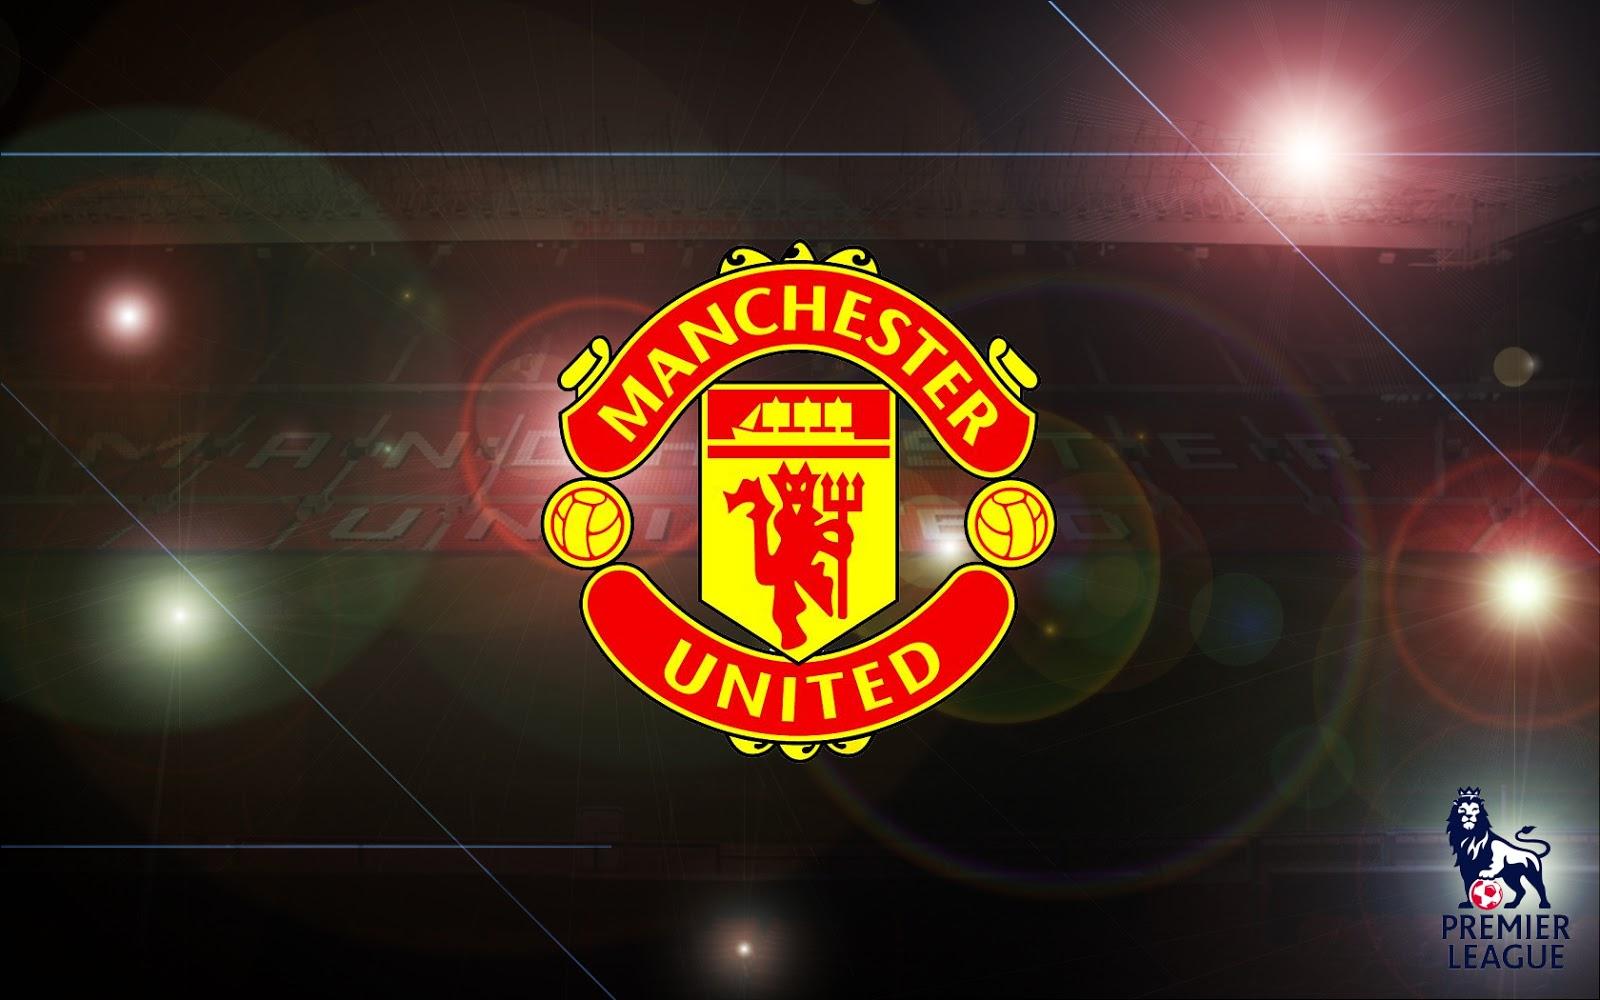 Manchester united fc logos manchester united fc logos monday january 21 2013 voltagebd Gallery